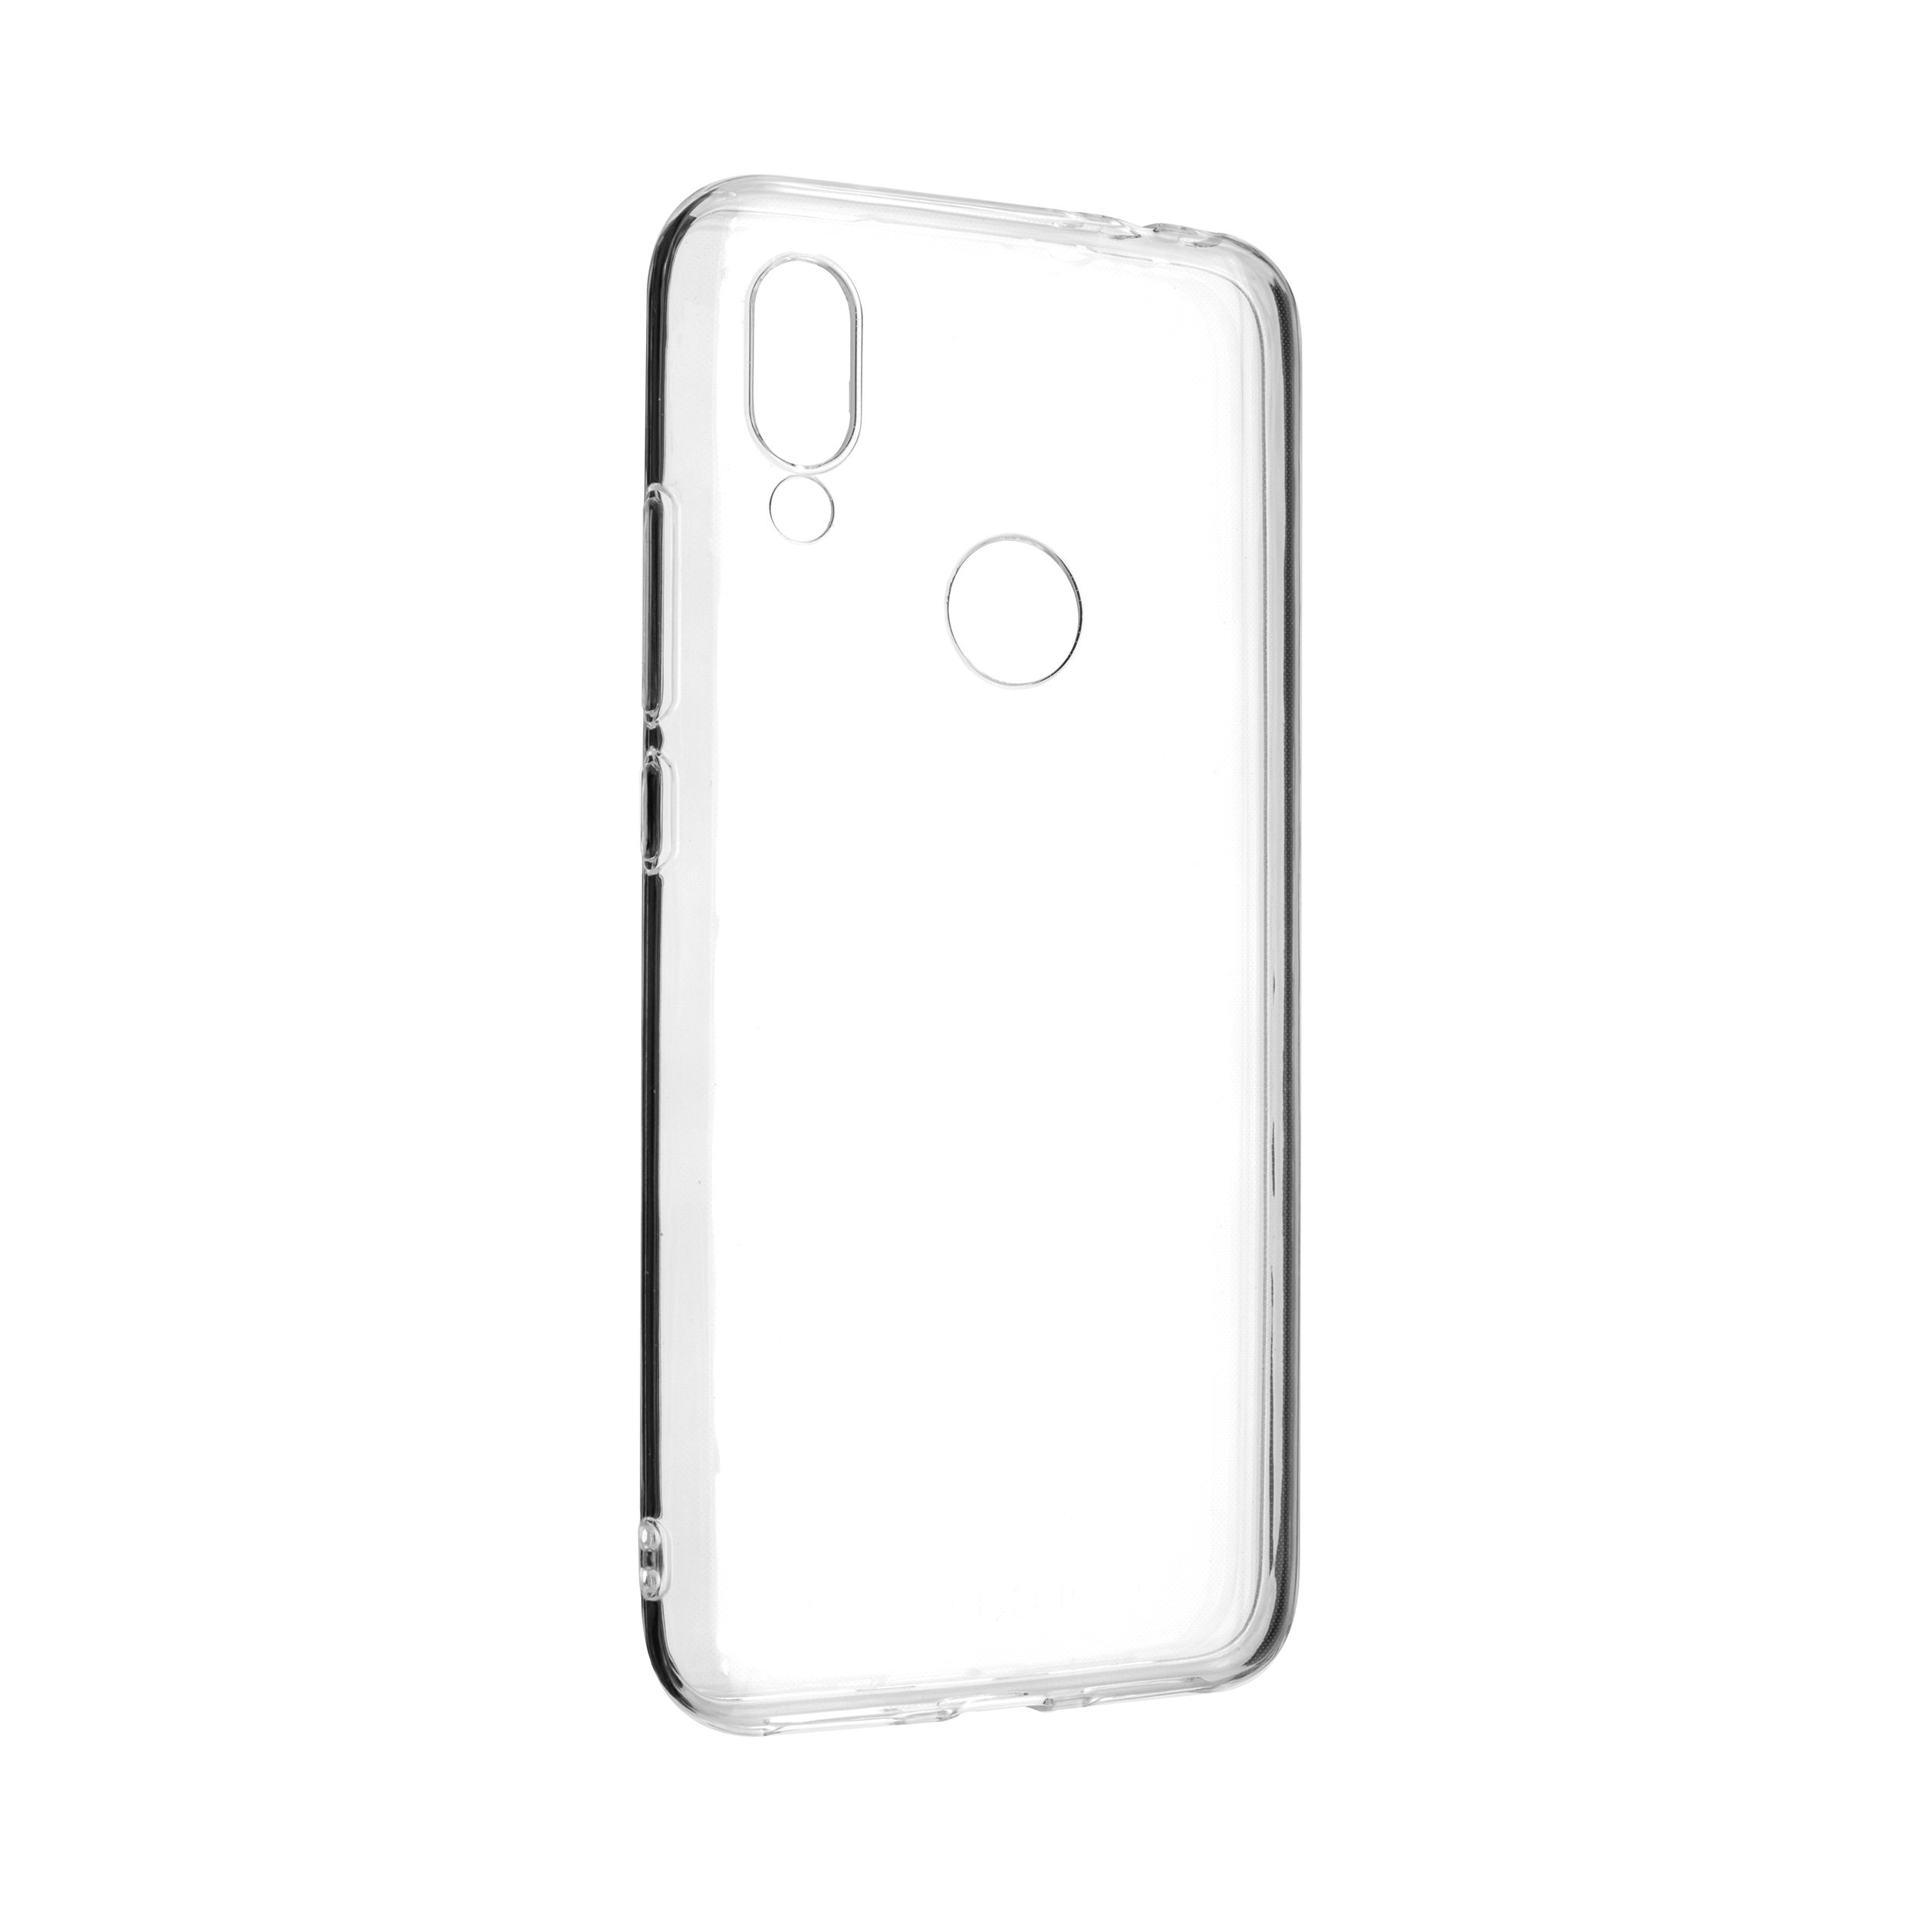 TPU gelové pouzdro FIXED pro Xiaomi Redmi 7, čiré